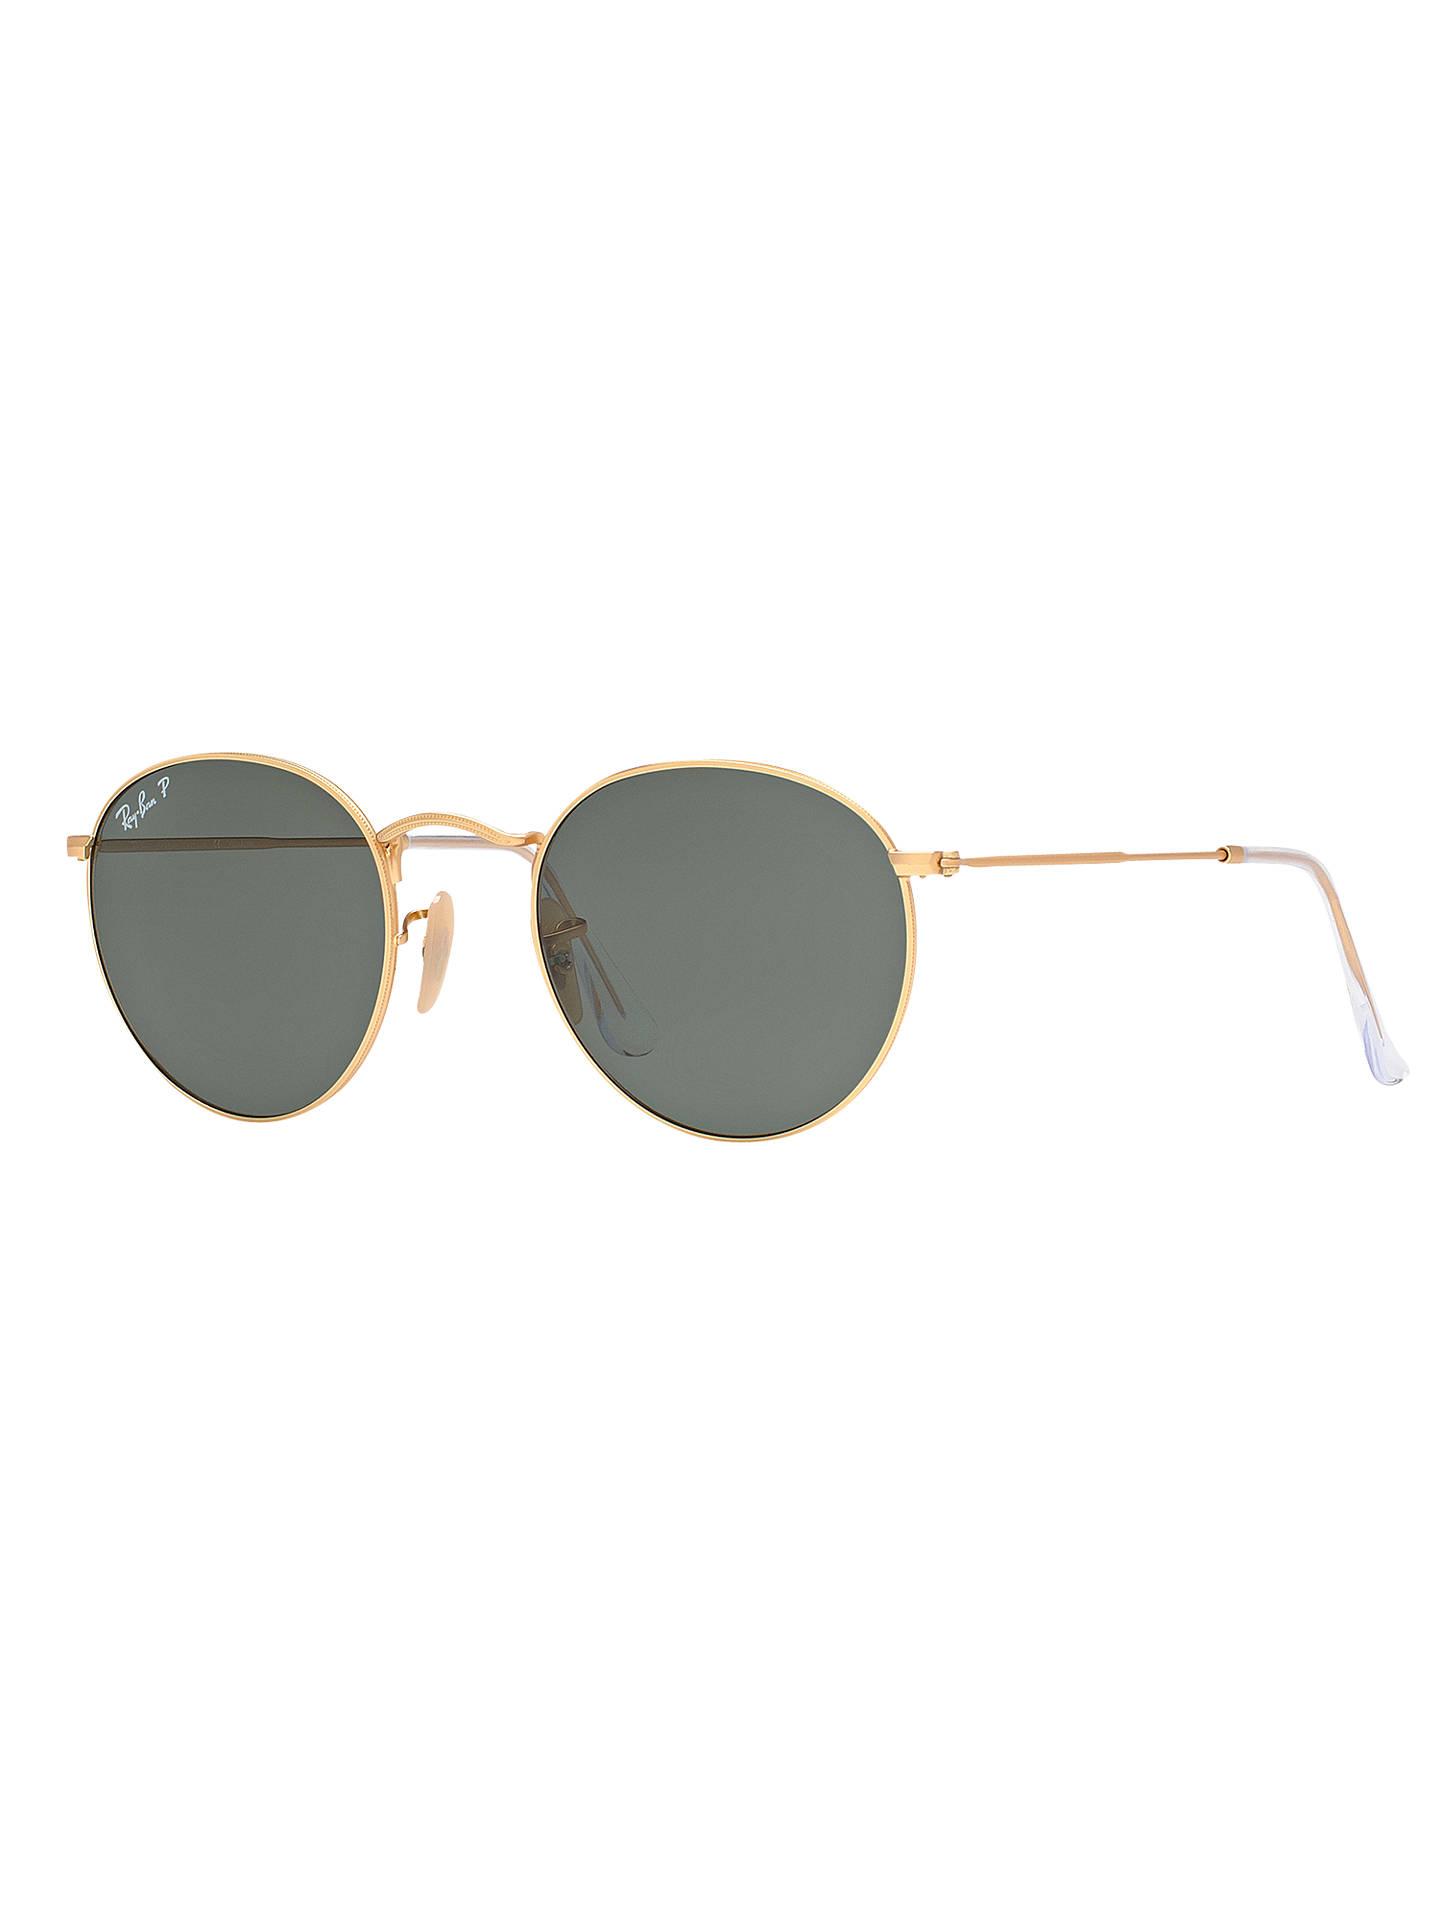 b7517864acf49 Buy Ray-Ban RB3447 Polarised Round Sunglasses